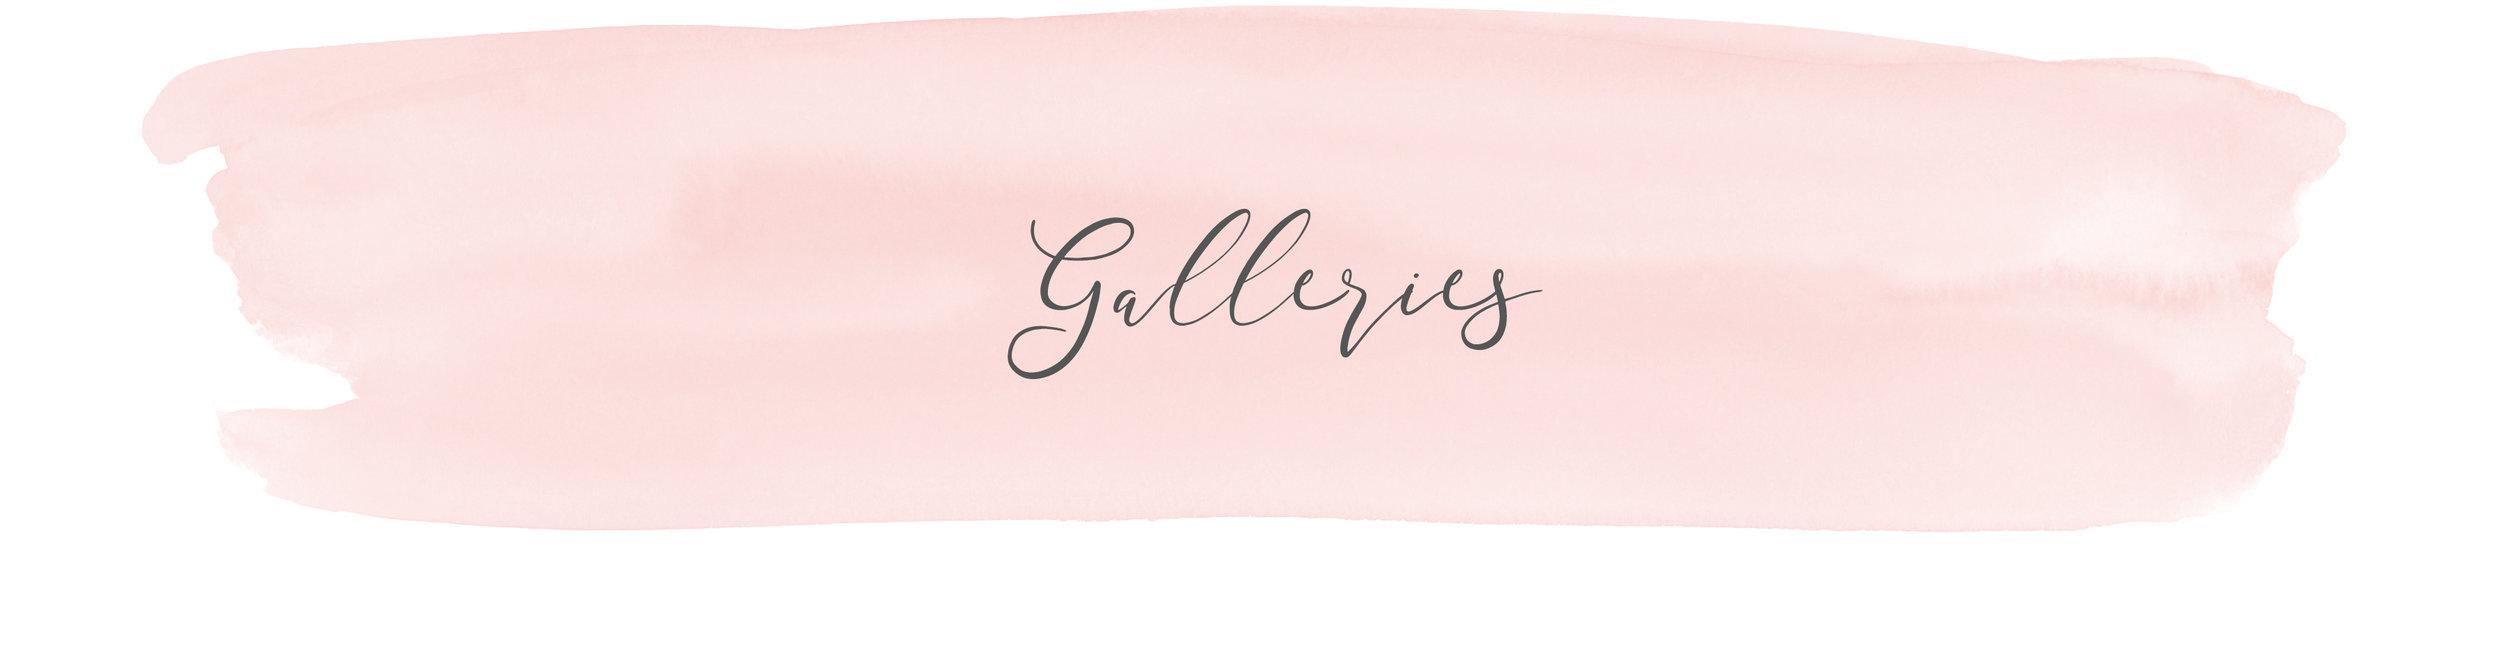 Galleries Paint Swatch.jpg